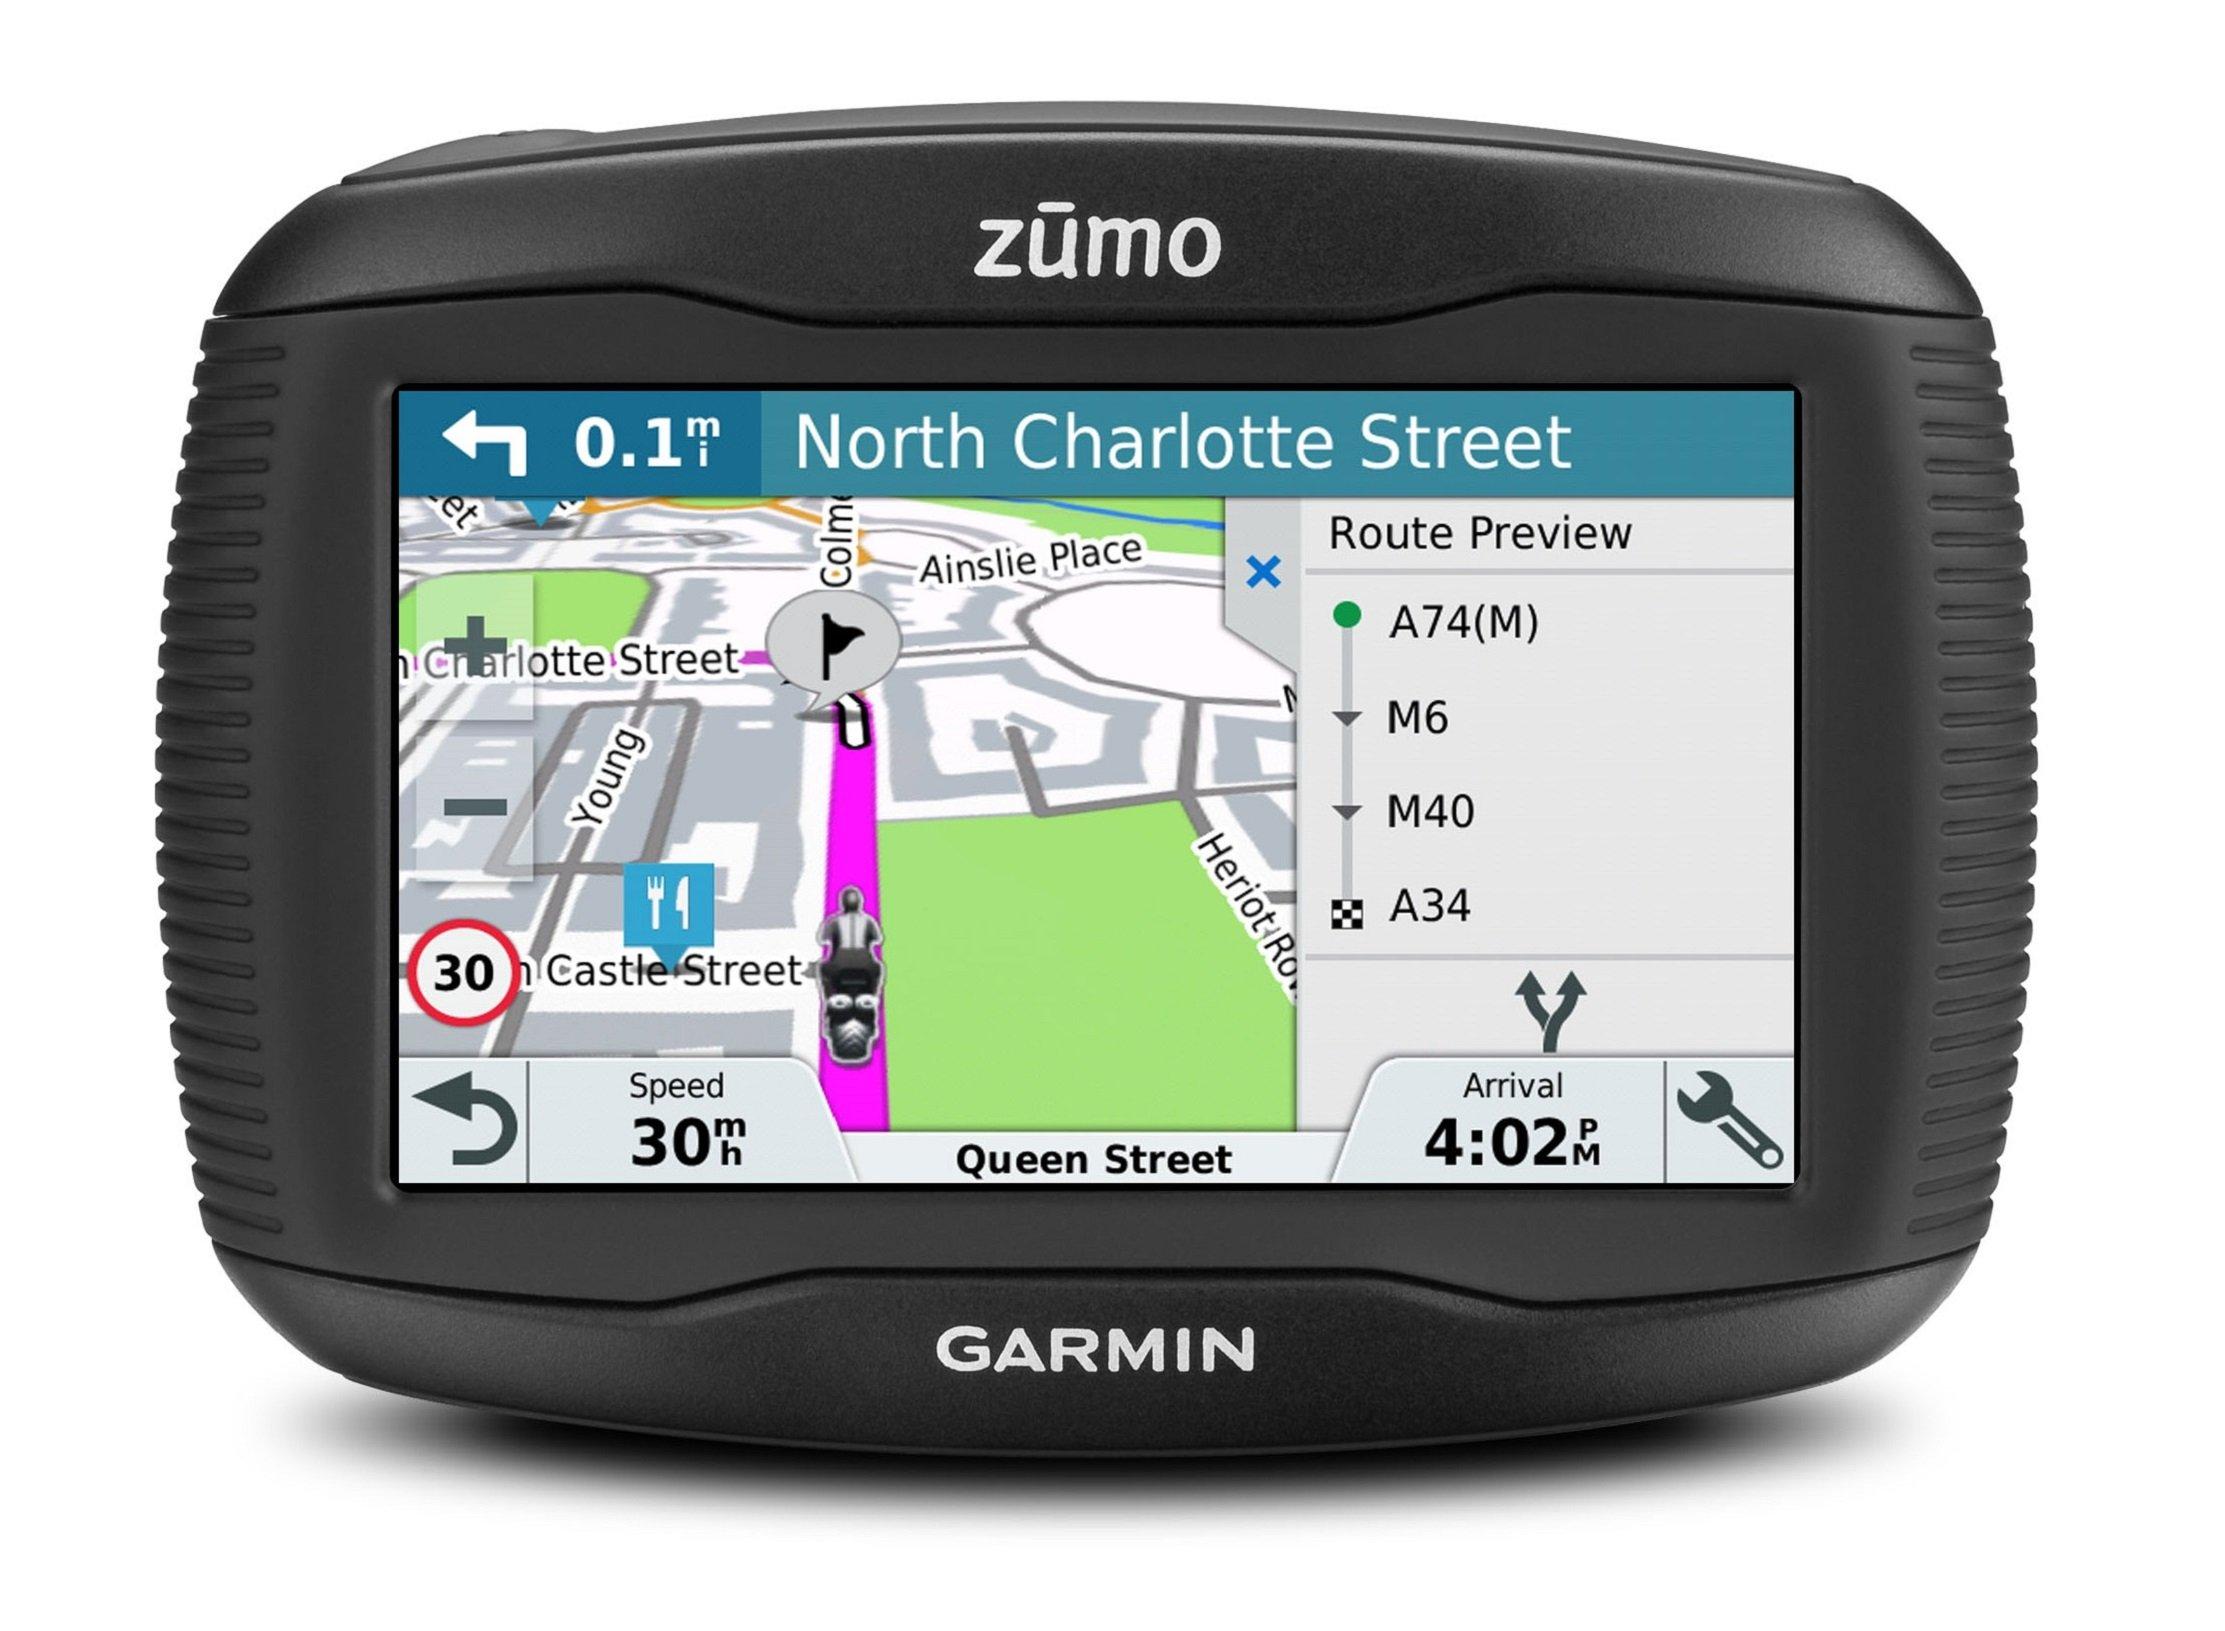 Garmin-zumo-Motorradnavigationsgert-Touchscreen-lebenslange-Kartenupdates